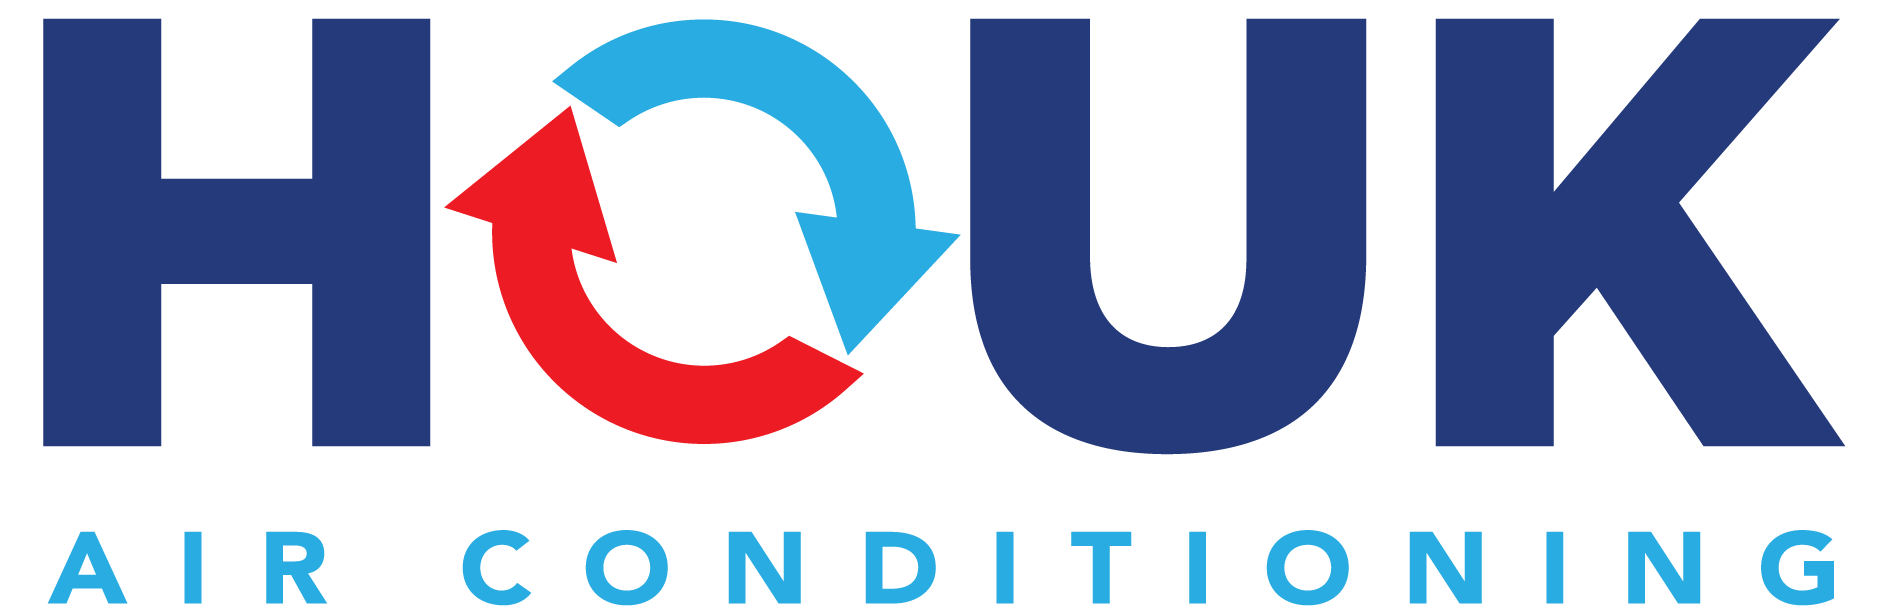 Houk Air Conditioning DFW